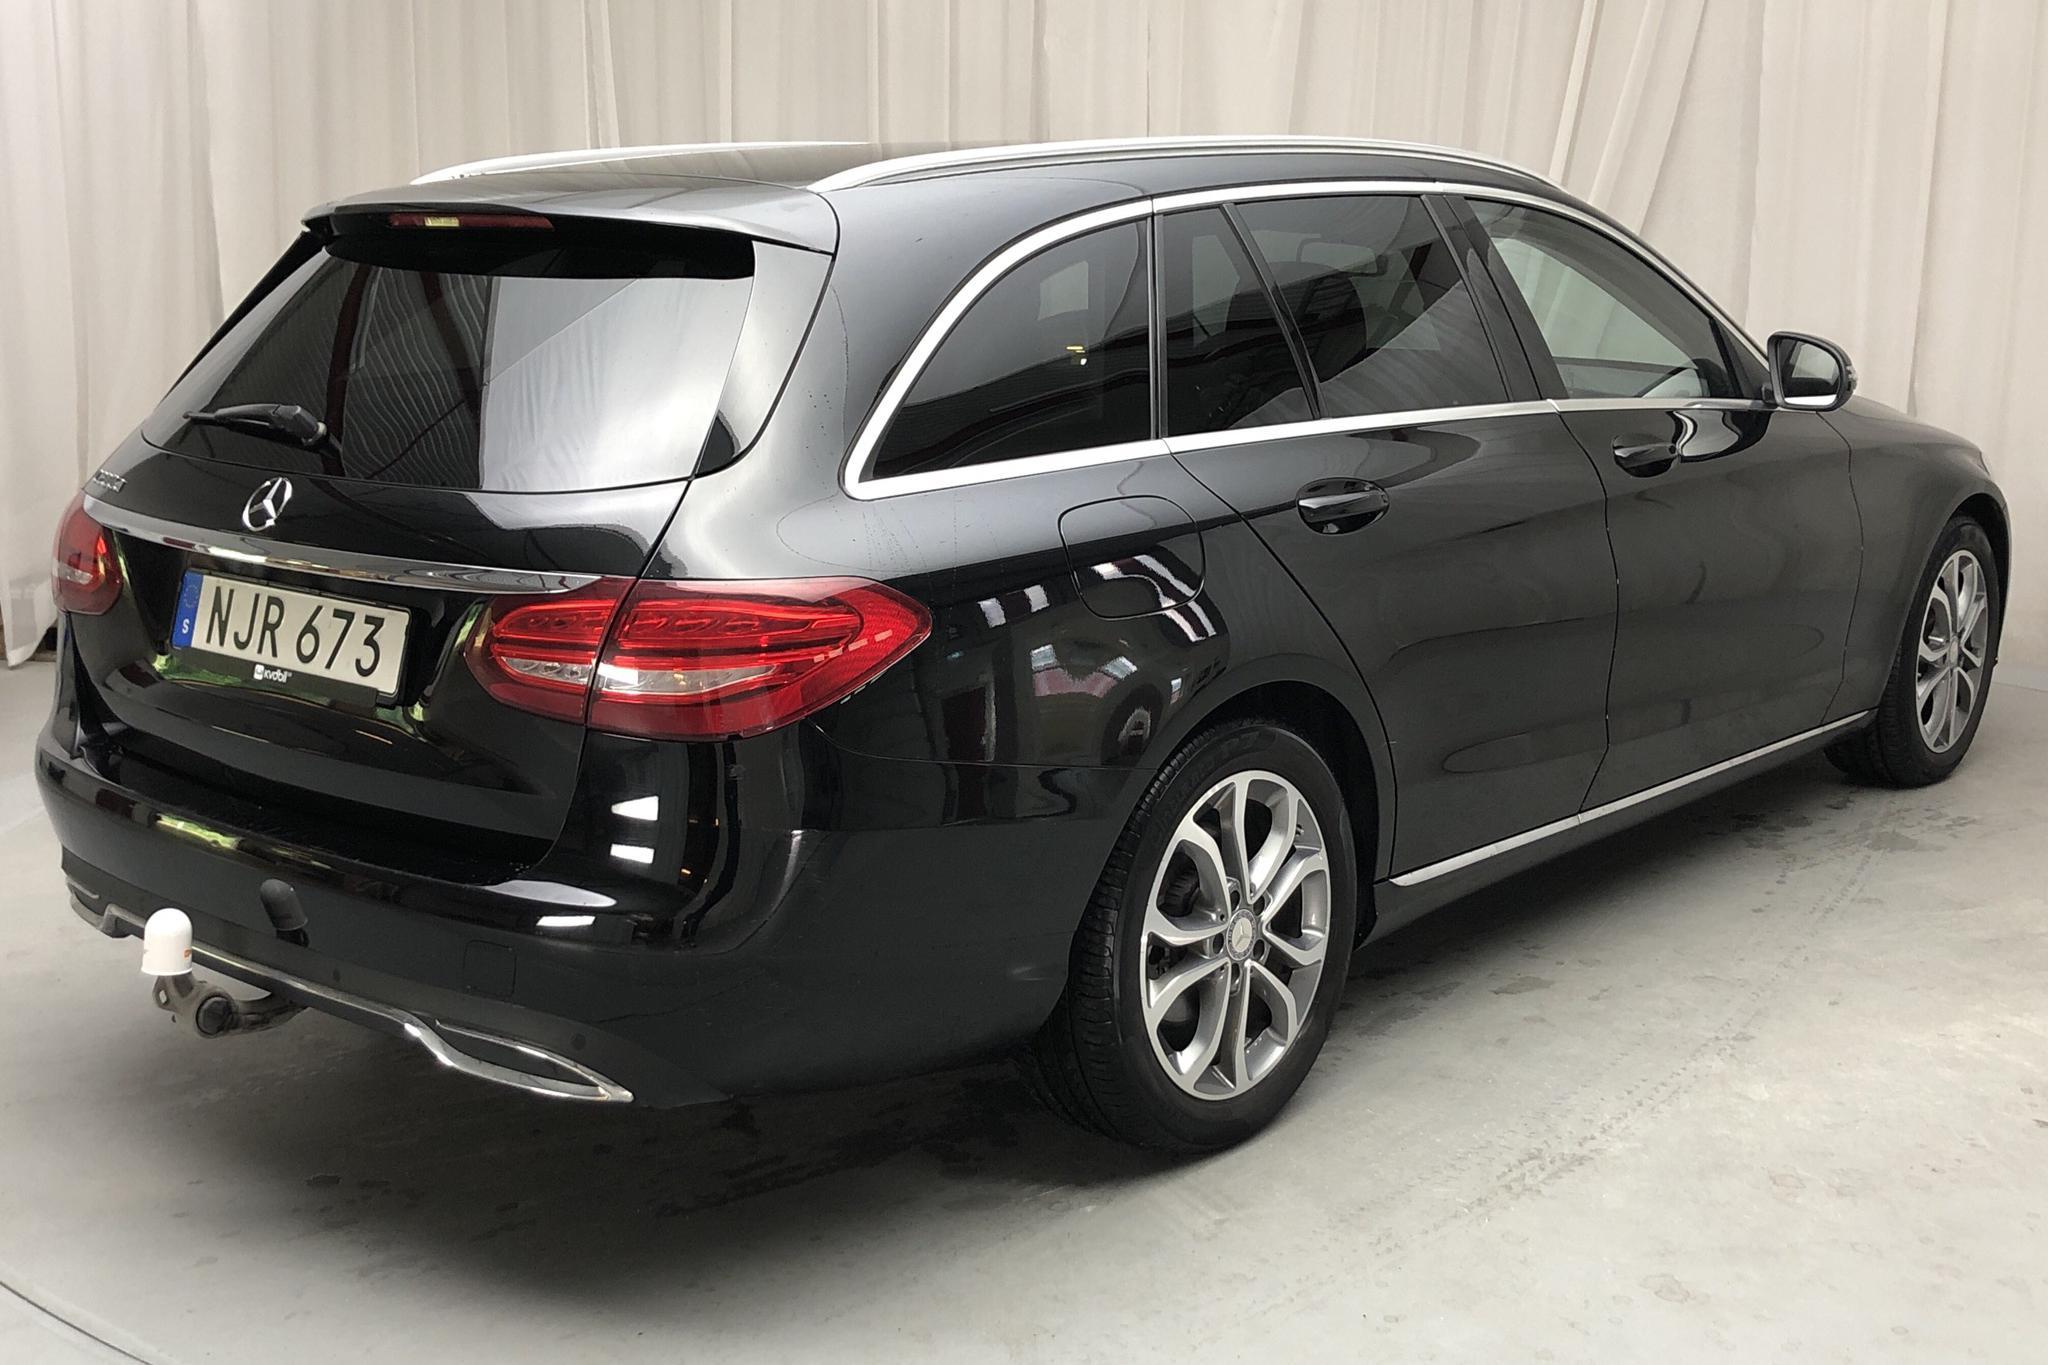 Mercedes C 200 BlueTEC Kombi S205 (136hk) - 107 750 km - Automatic - black - 2016